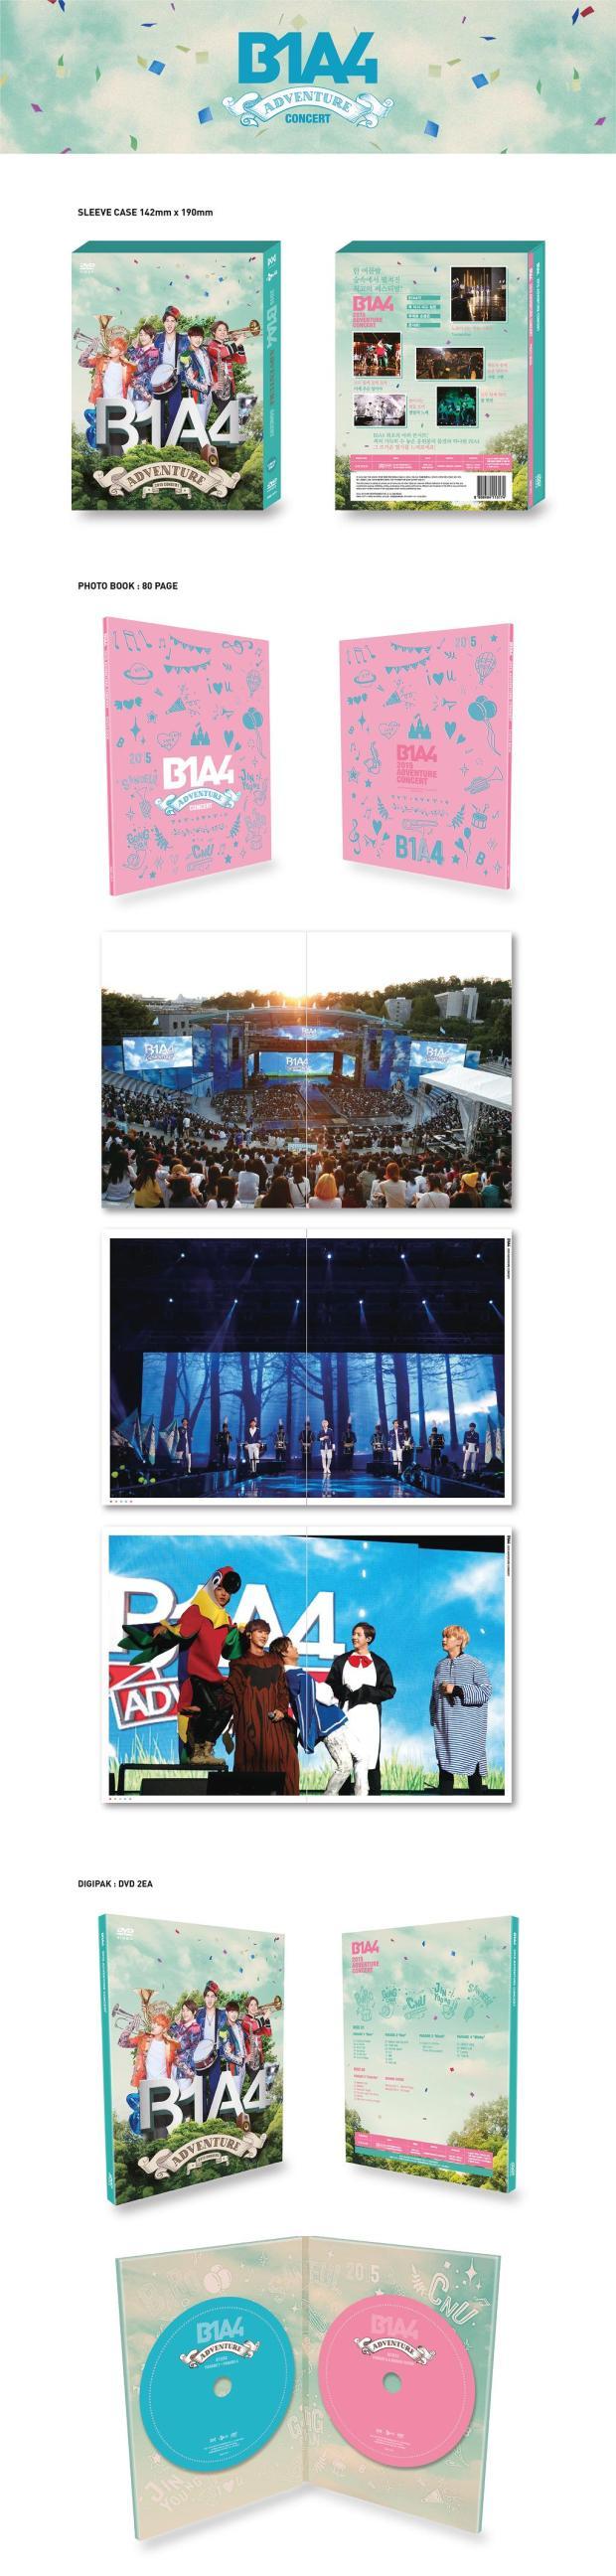 2015 B1A4 Adventure DVD